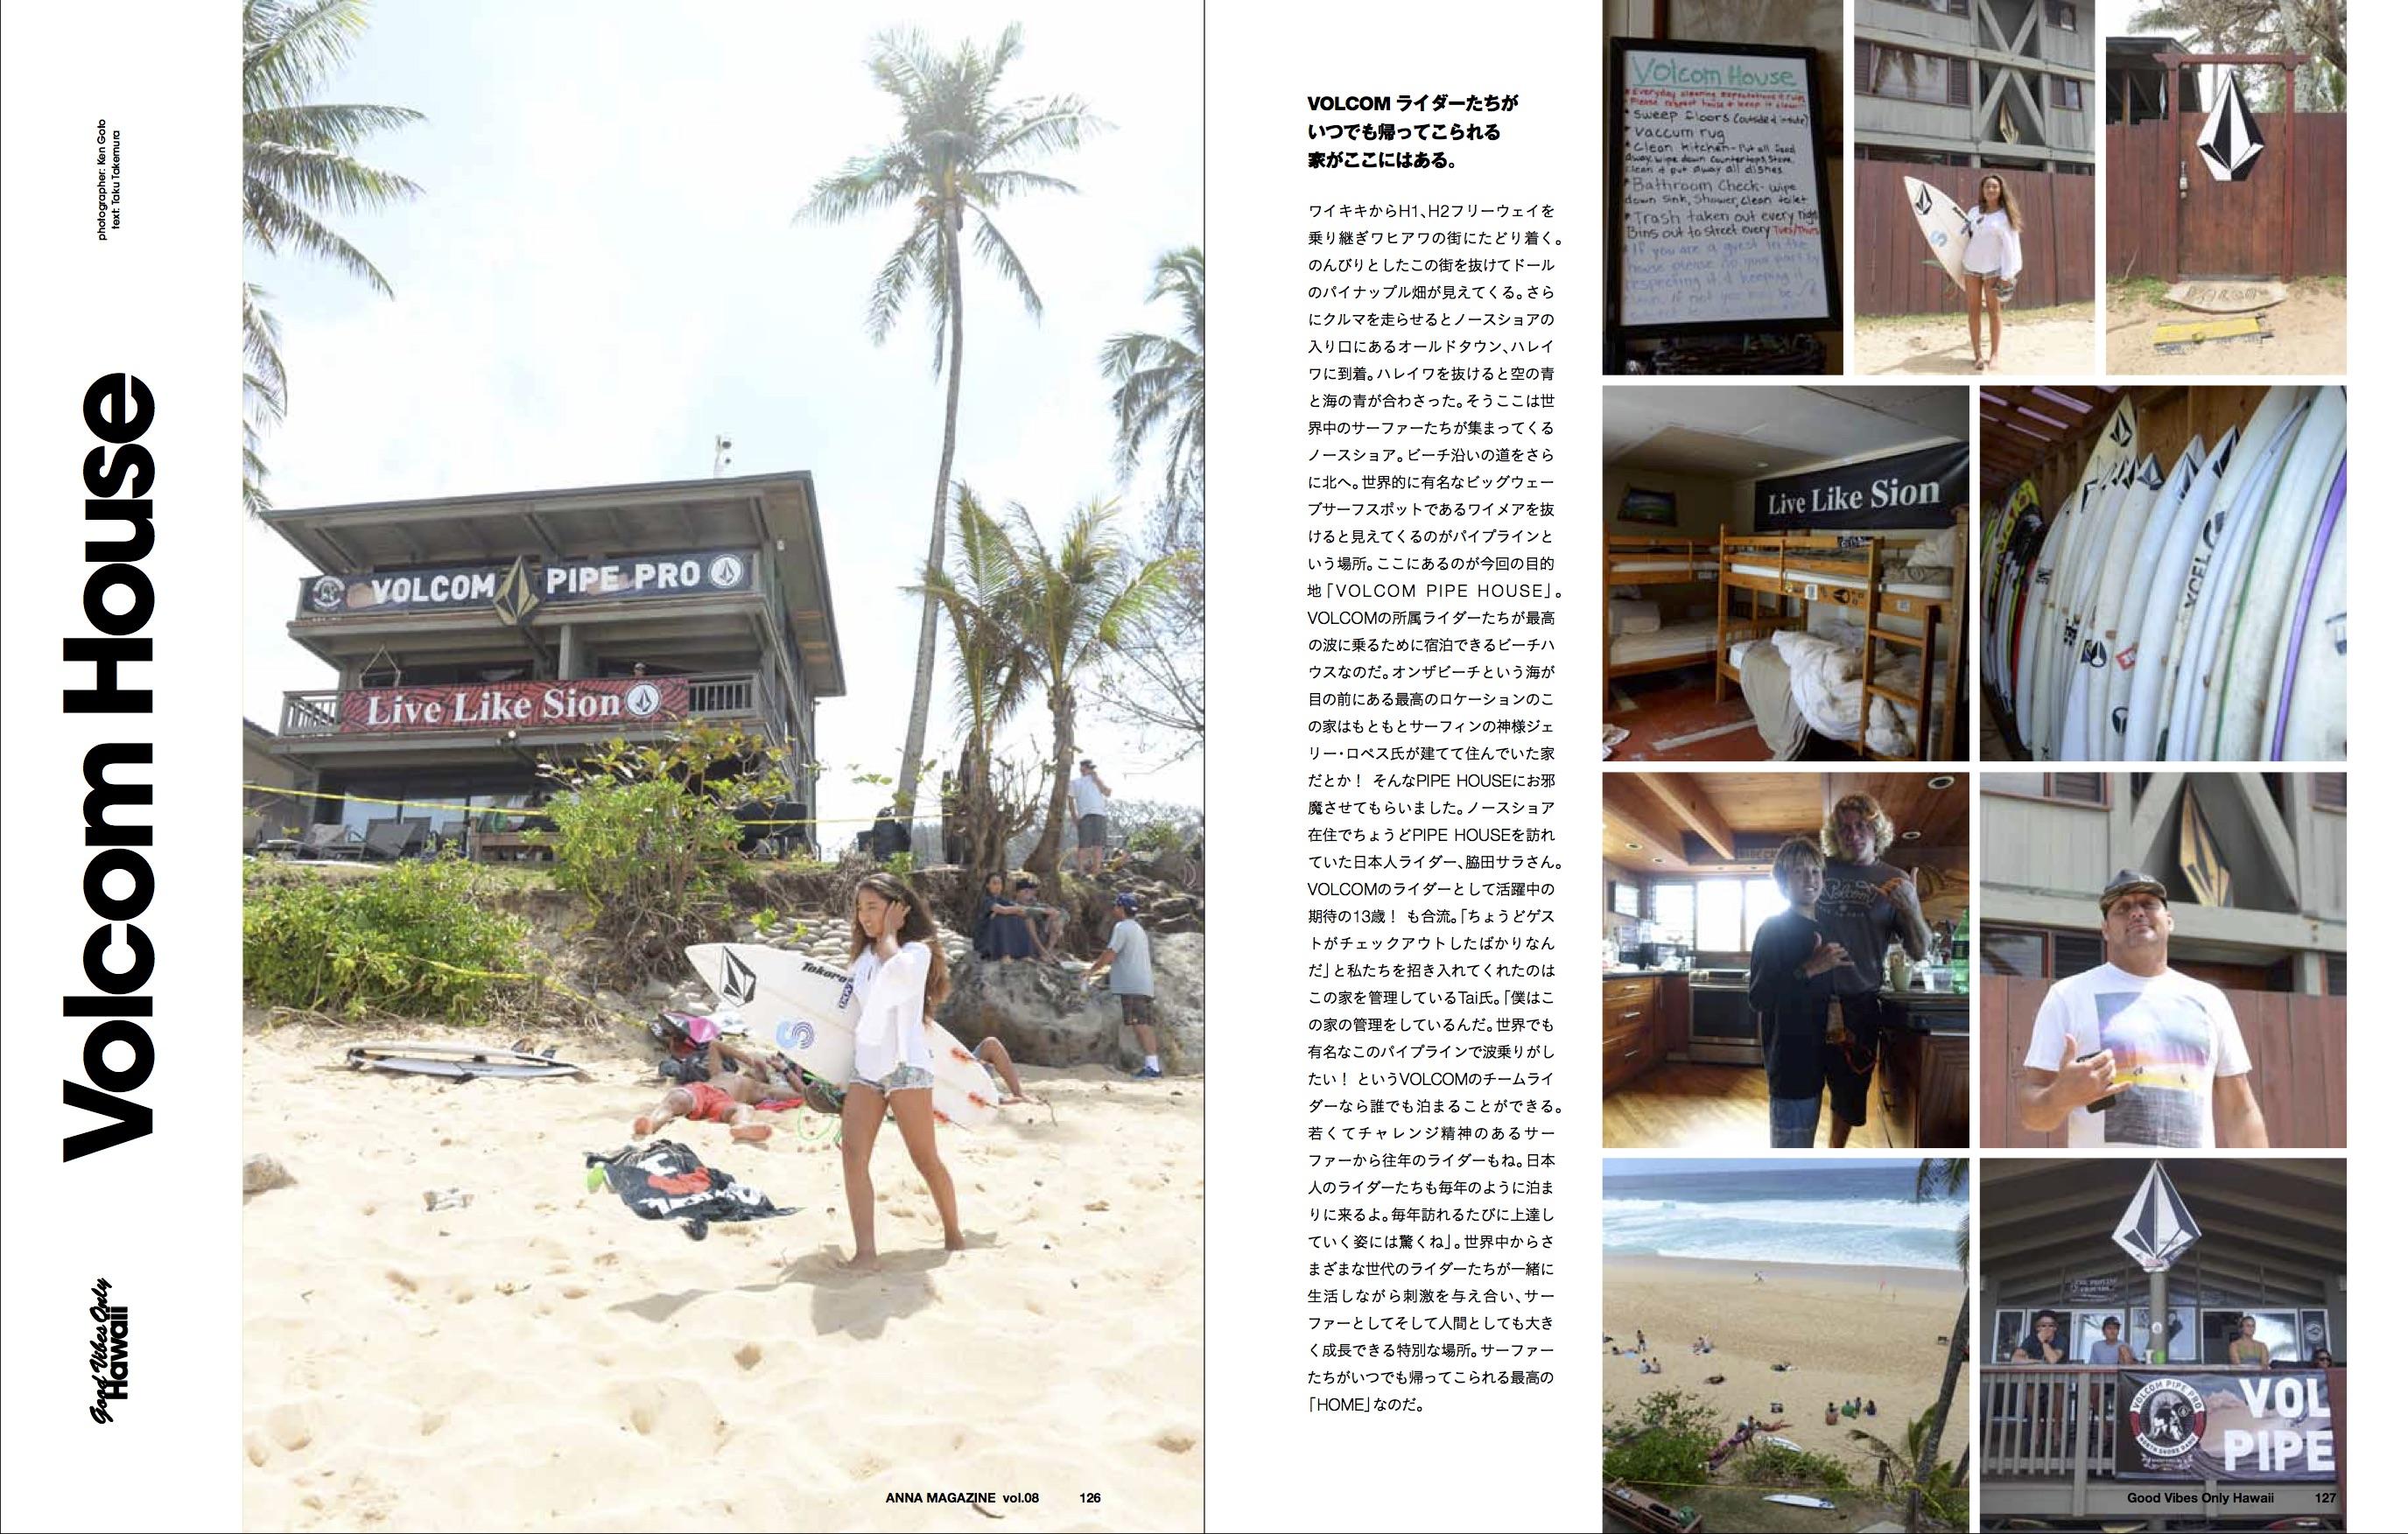 anna magazine vol.8 P61